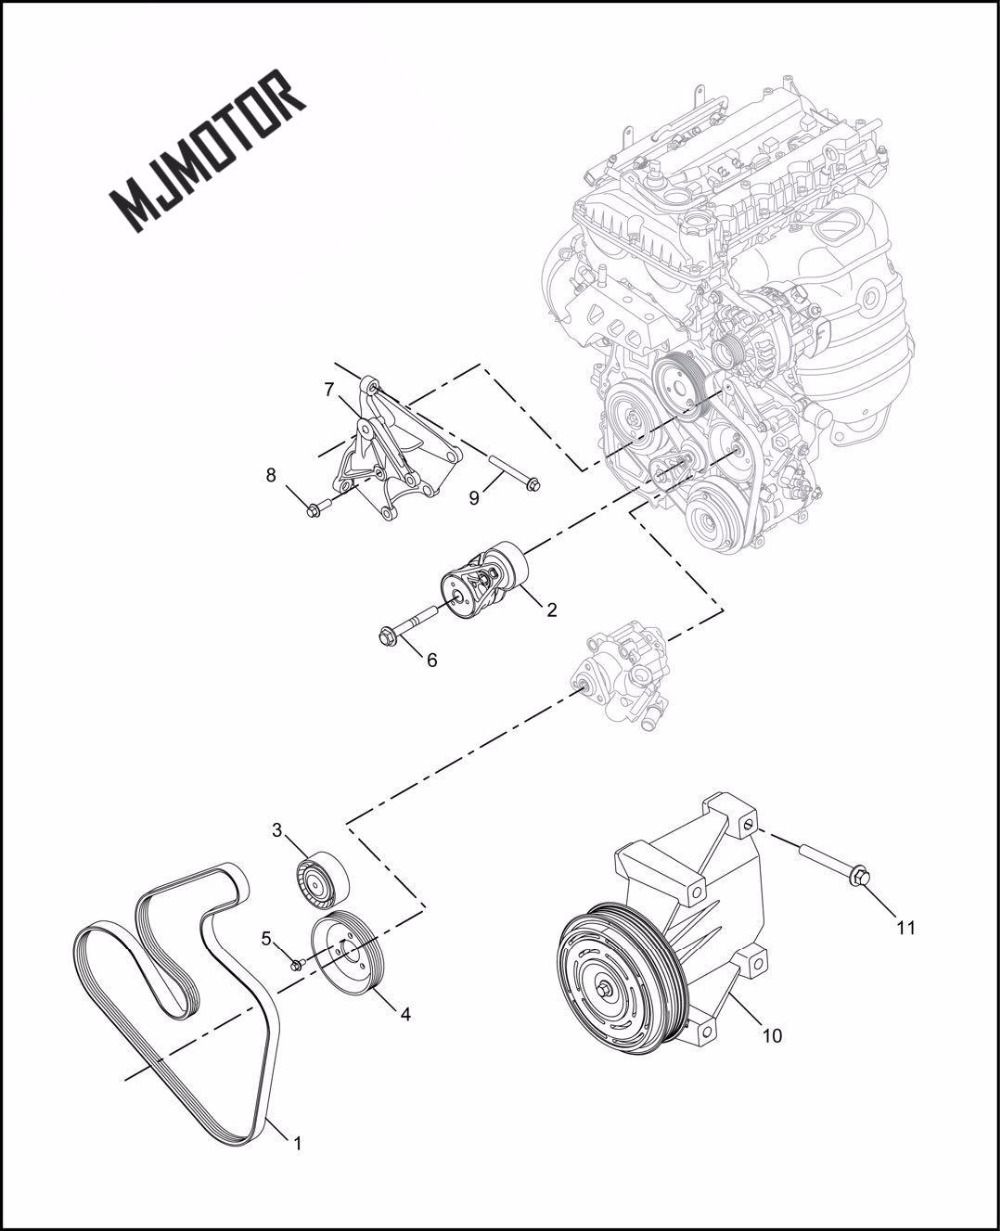 US $22.95  Alternator fan belt Kit Generator tensioner Idler Pulley on daihatsu rocky wiring diagram, bentley wiring diagram, triumph tr4a wiring diagram, mack wiring diagram, willys wiring diagram, acura rl wiring diagram, commercial motor wiring diagram, sterling wiring diagram, packard wiring diagram, volvo wiring diagram, western star wiring diagram, bmw m5 wiring diagram, jaguar xk8 wiring diagram, bmw x3 wiring diagram, winnebago wiring diagram, acura cl wiring diagram, bmw m6 wiring diagram, toyota van wiring diagram, car wiring diagram, evo wiring diagram,